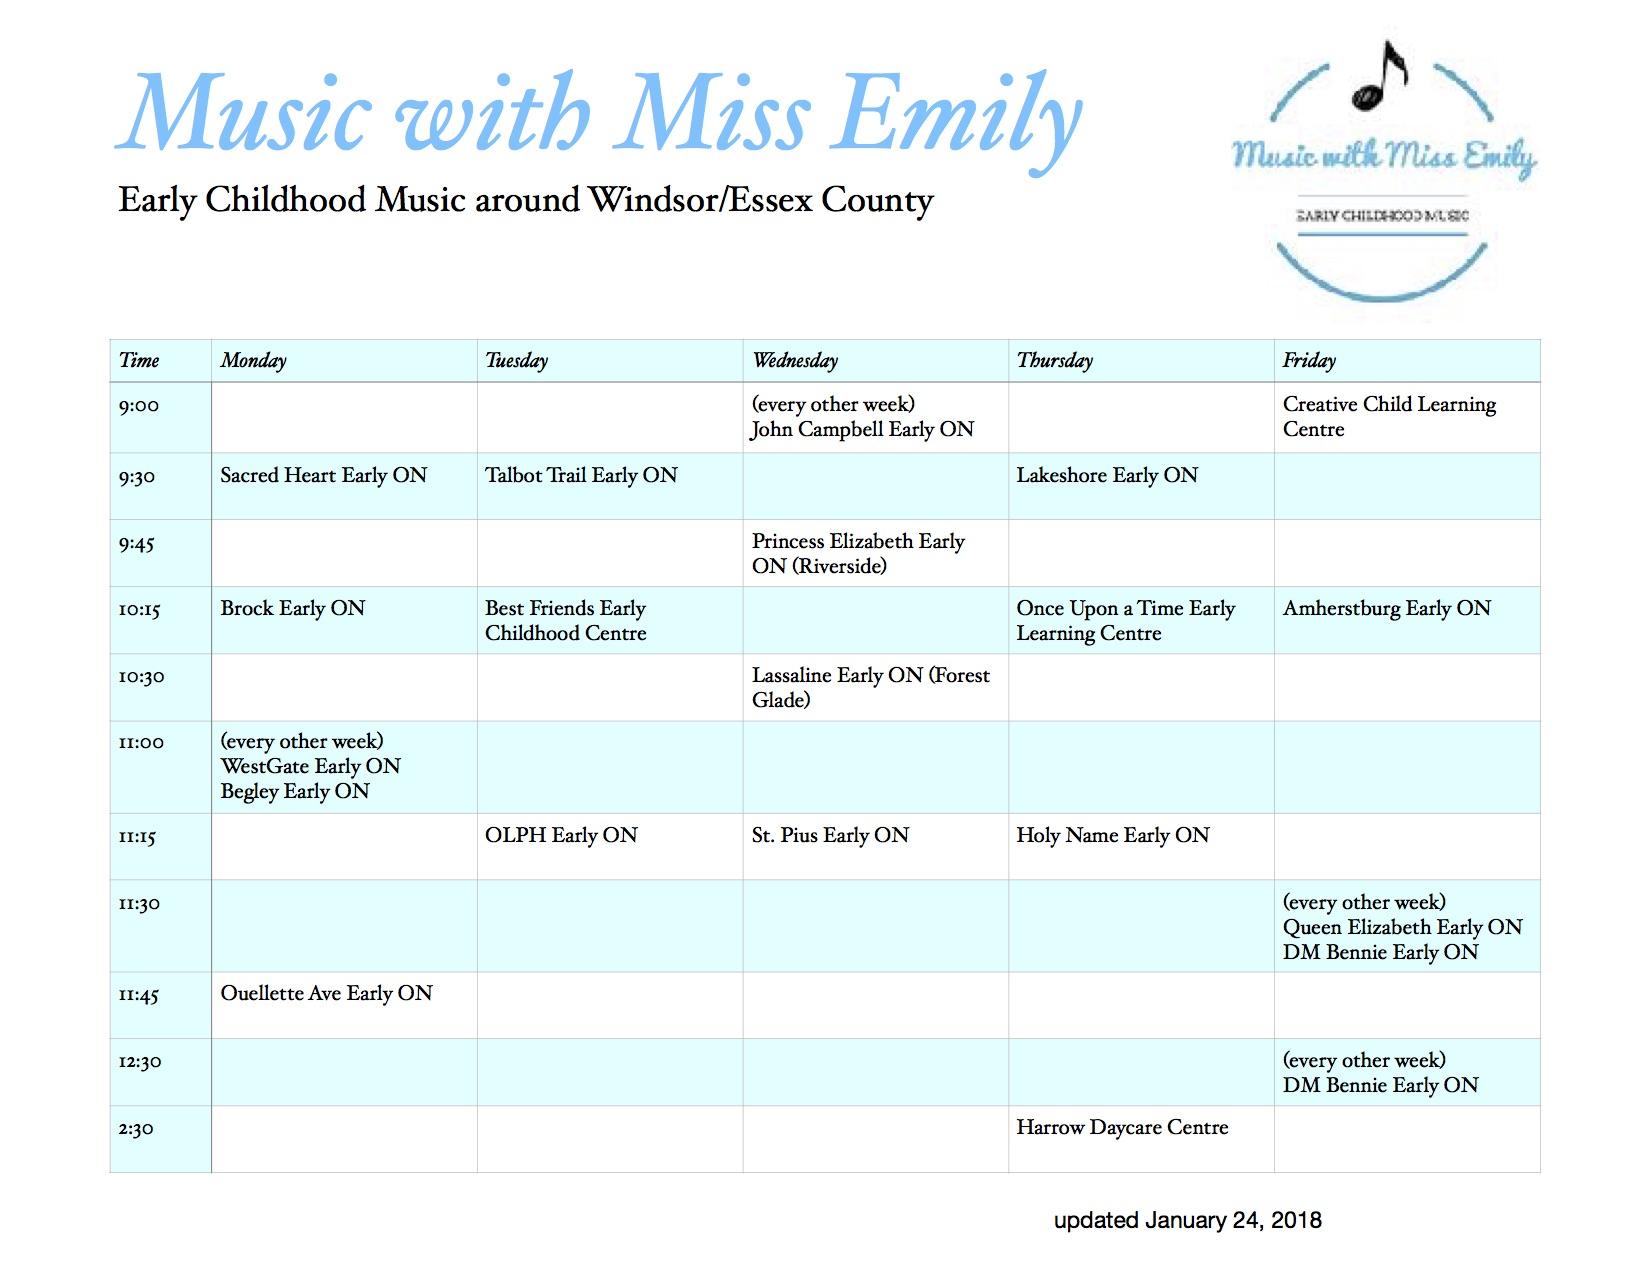 Music with Miss Emily Jan 2018 schedule.jpg